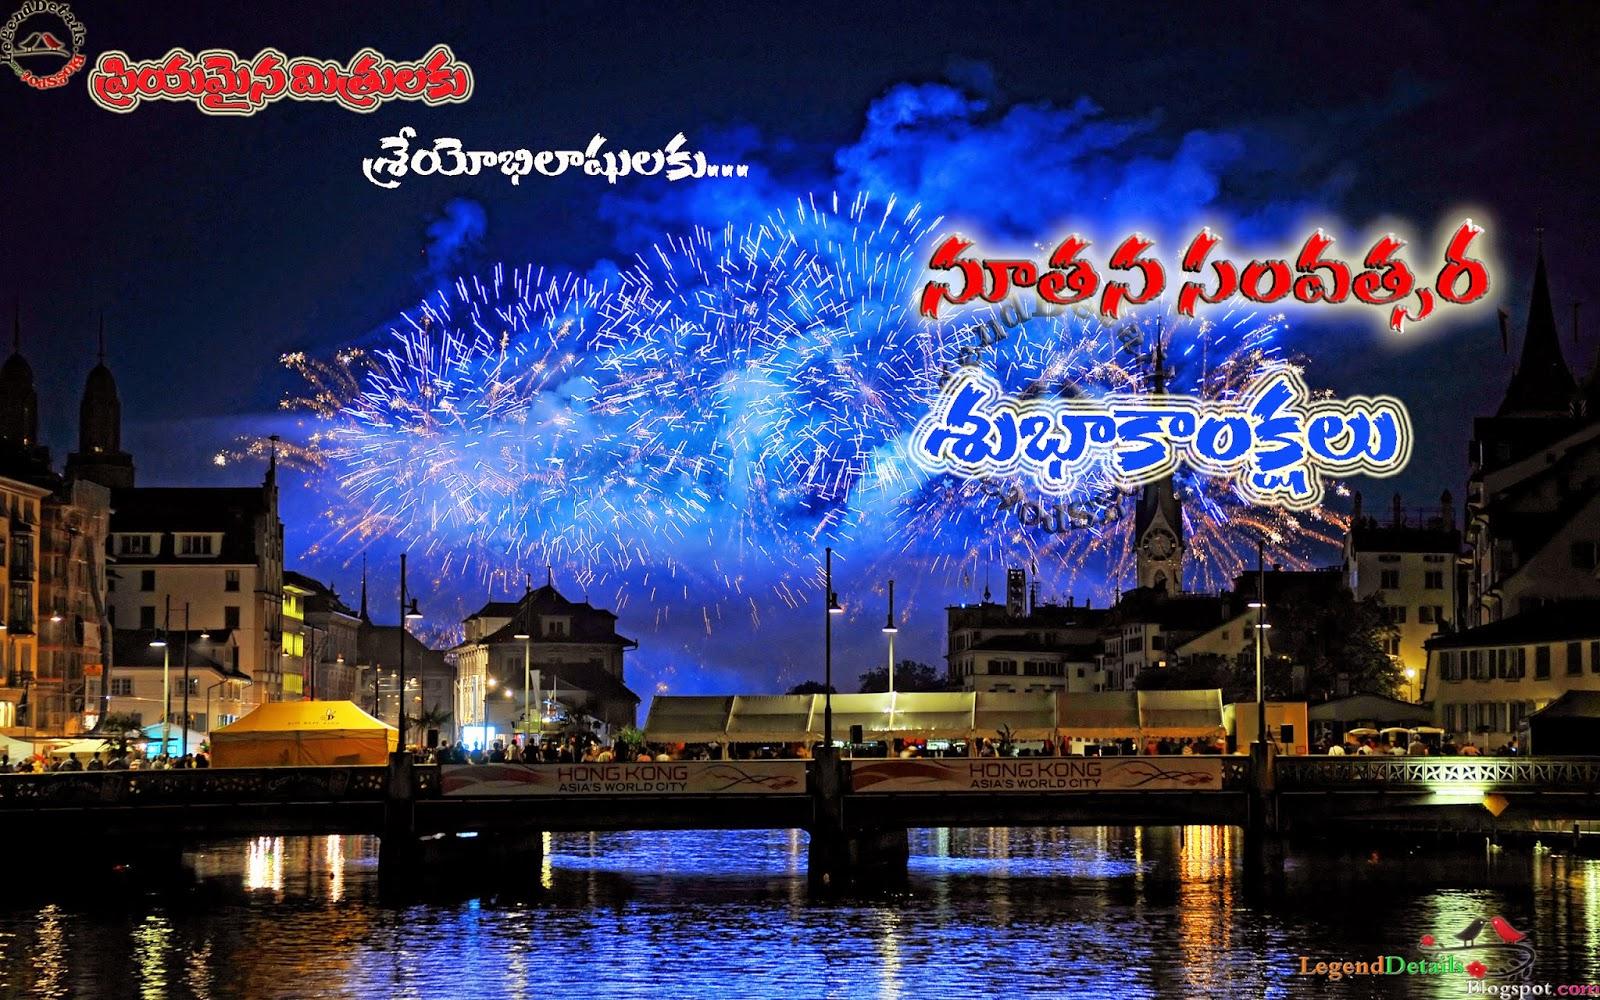 Telugu new year greetings 2015 telugu happy new year wallpapers telugu new year greetings 2015 telugu happy new year wallpapers 2015 hd telugu new kristyandbryce Image collections